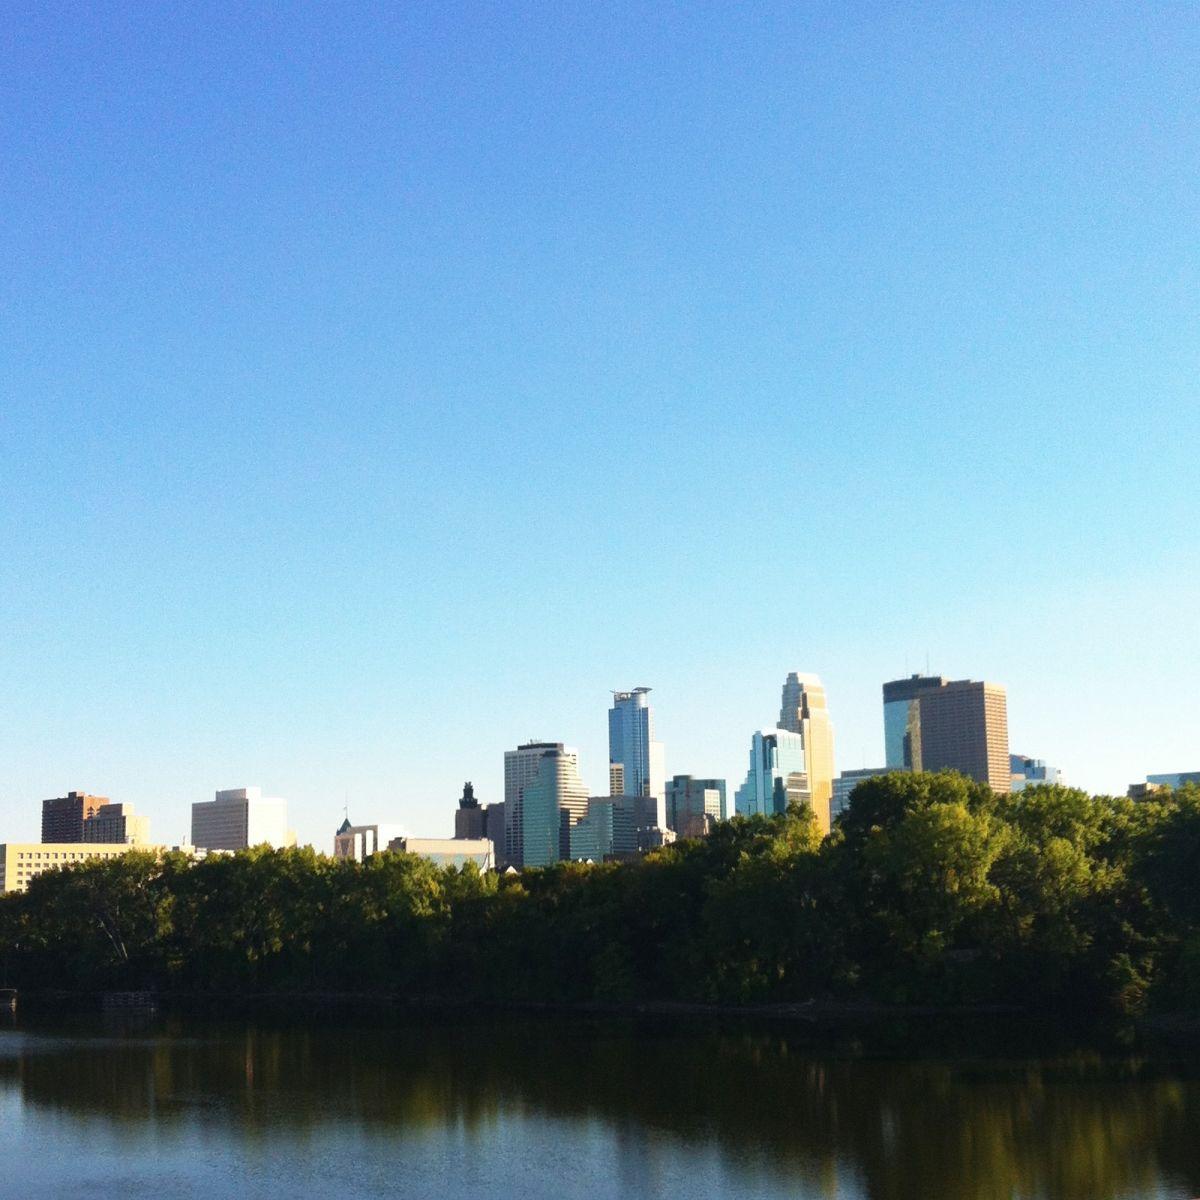 Minneapolis skyline from the Plymouth Avenue Bridge.